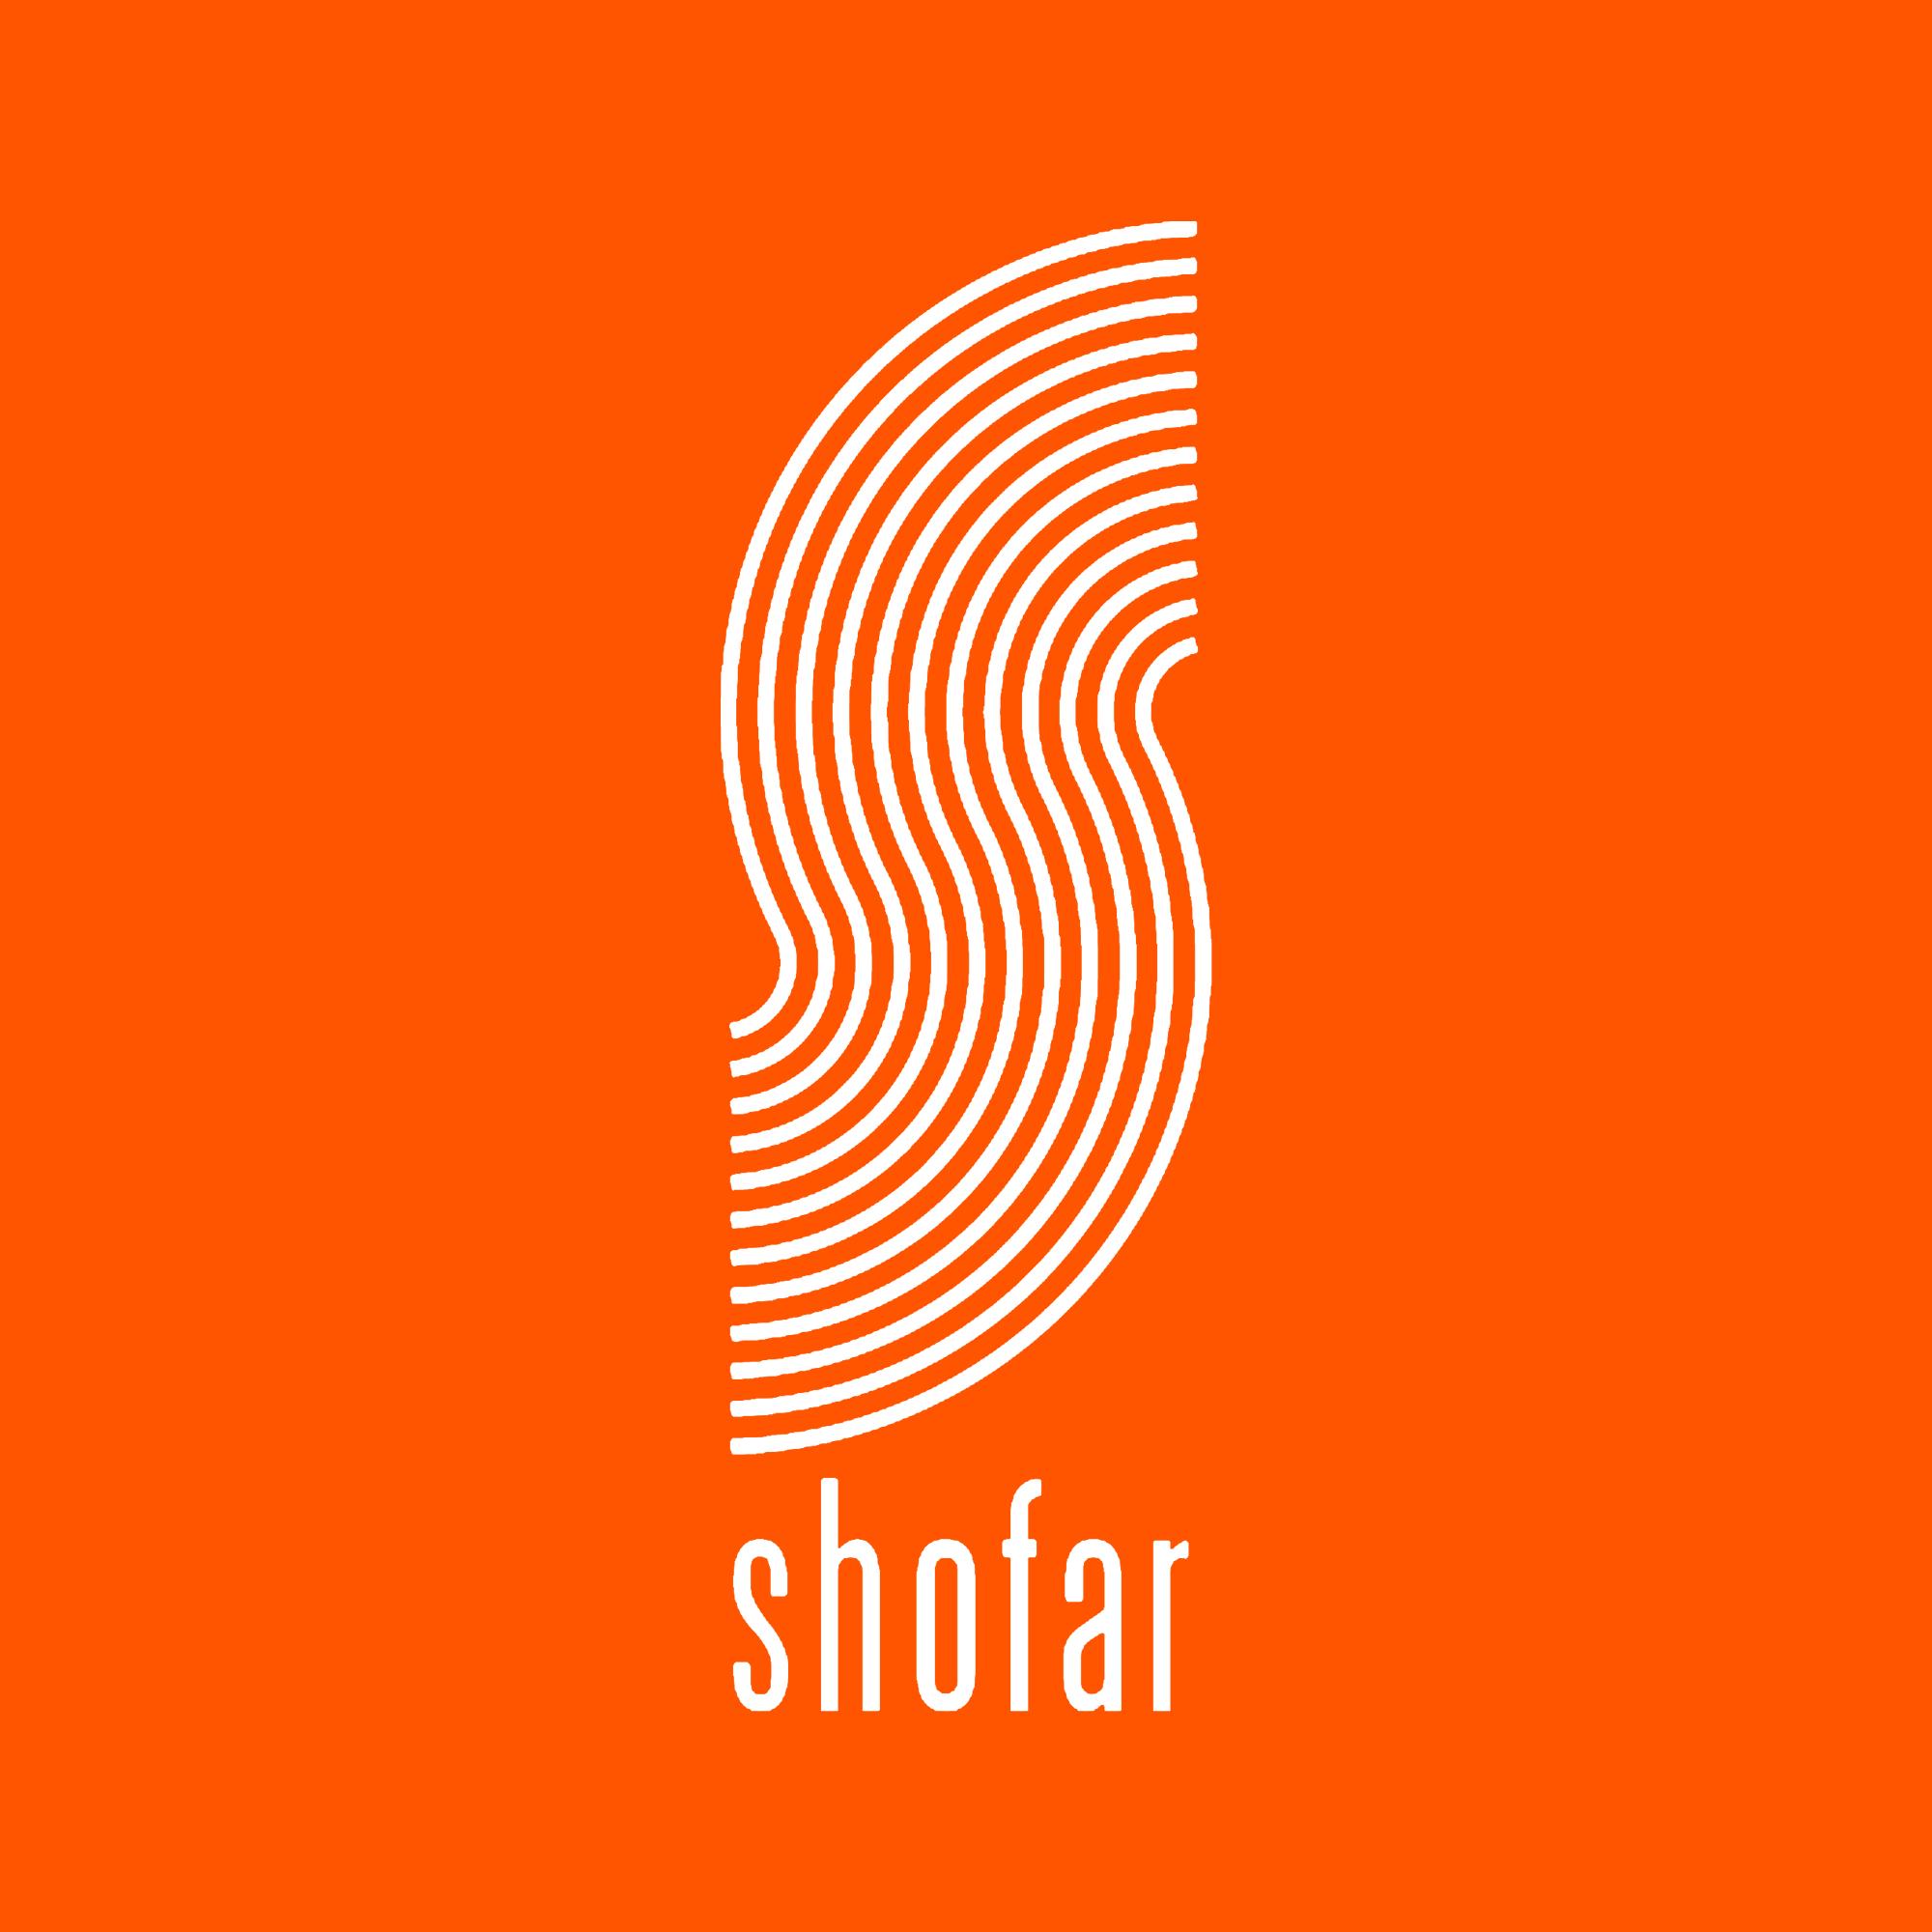 Shofar George (ShofarGeorge) Profile Image | Linktree